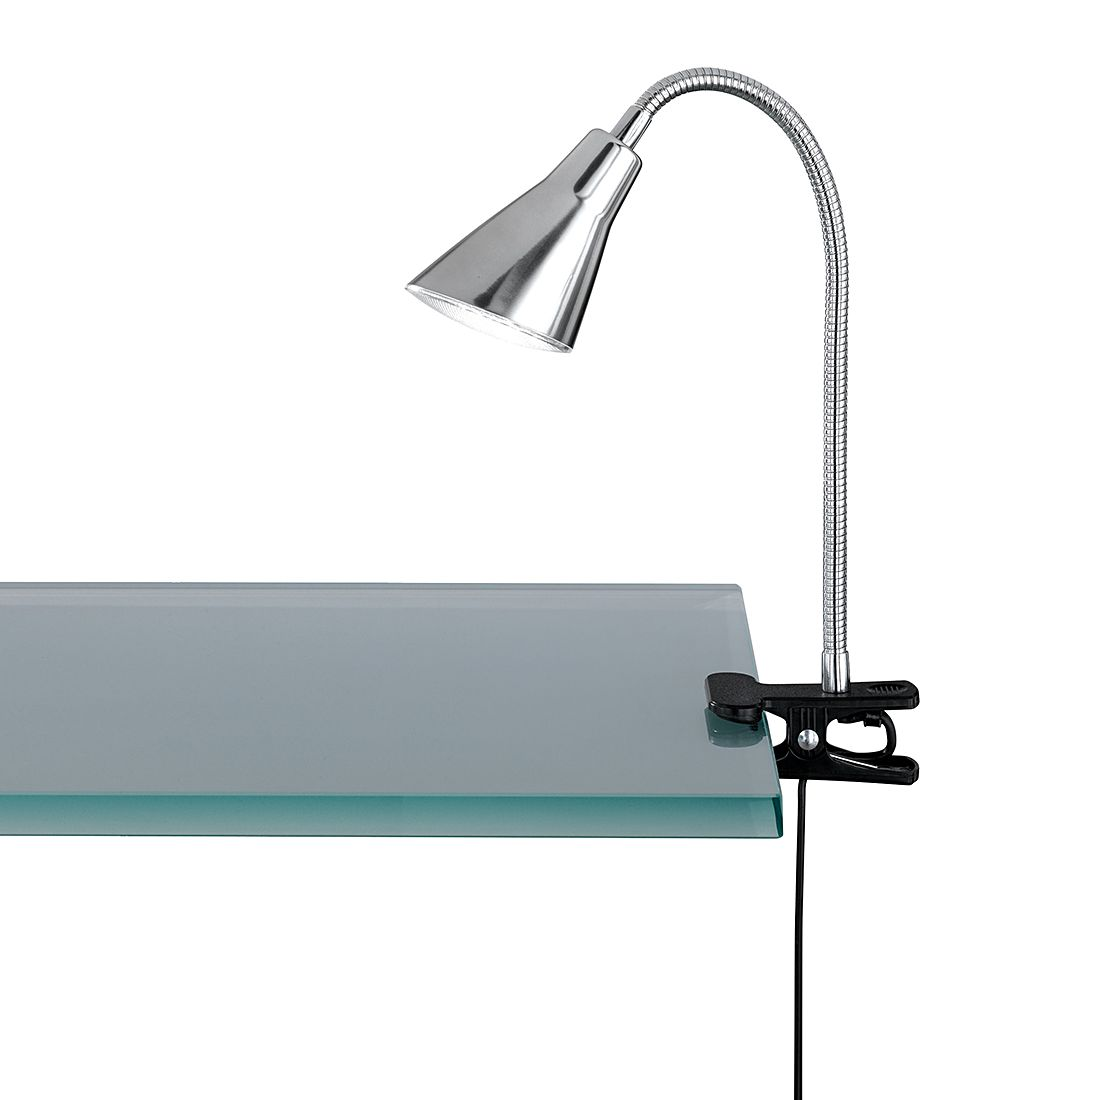 LED-klemlap - nikkelkleurig 1x4,2W, Trio